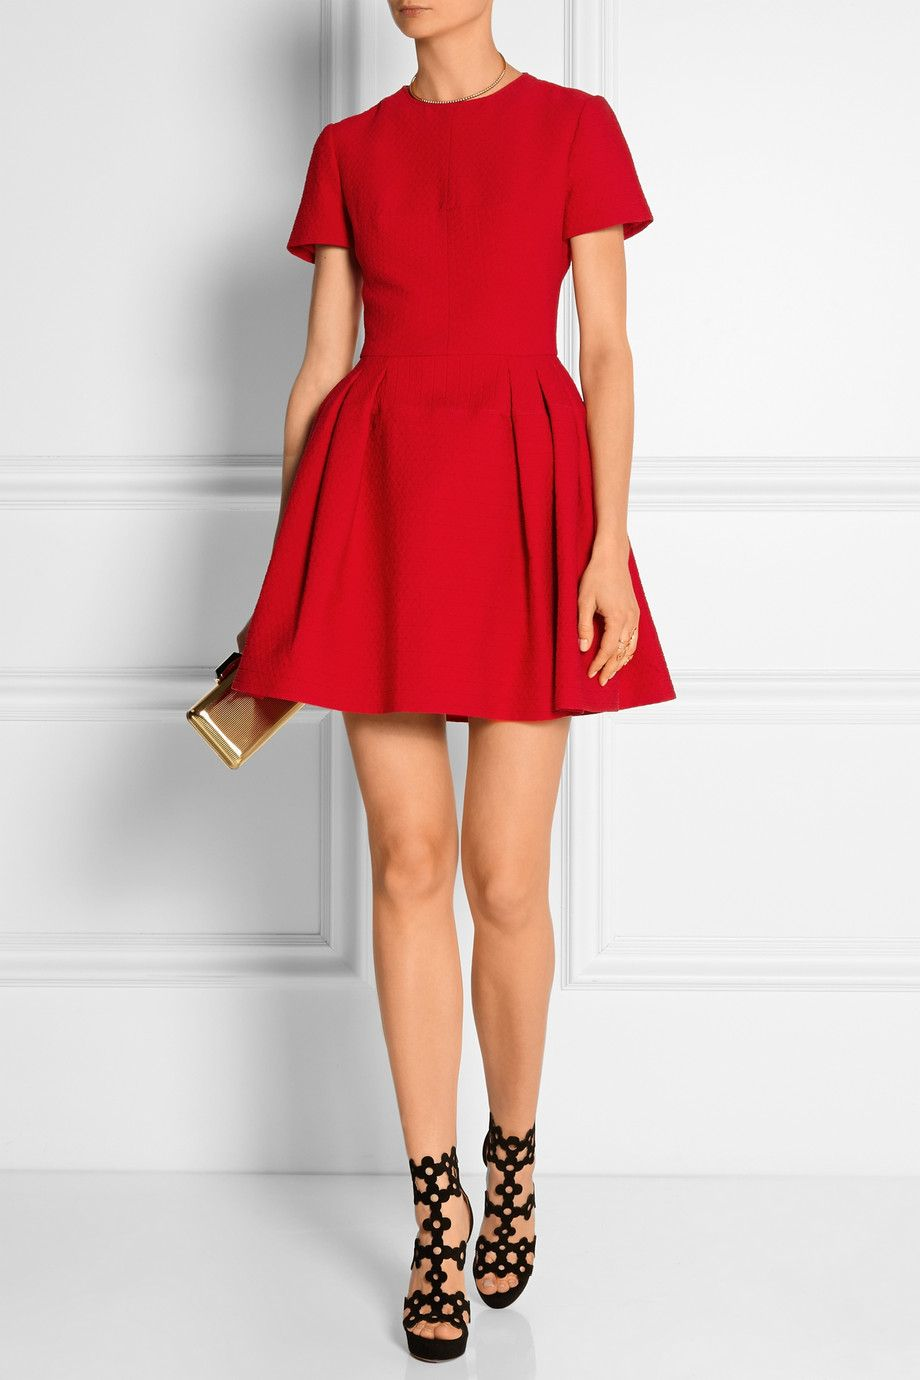 Alexander McQueen Dress|Alaïa | Laser-cut suede sandals| Kotur Clutch